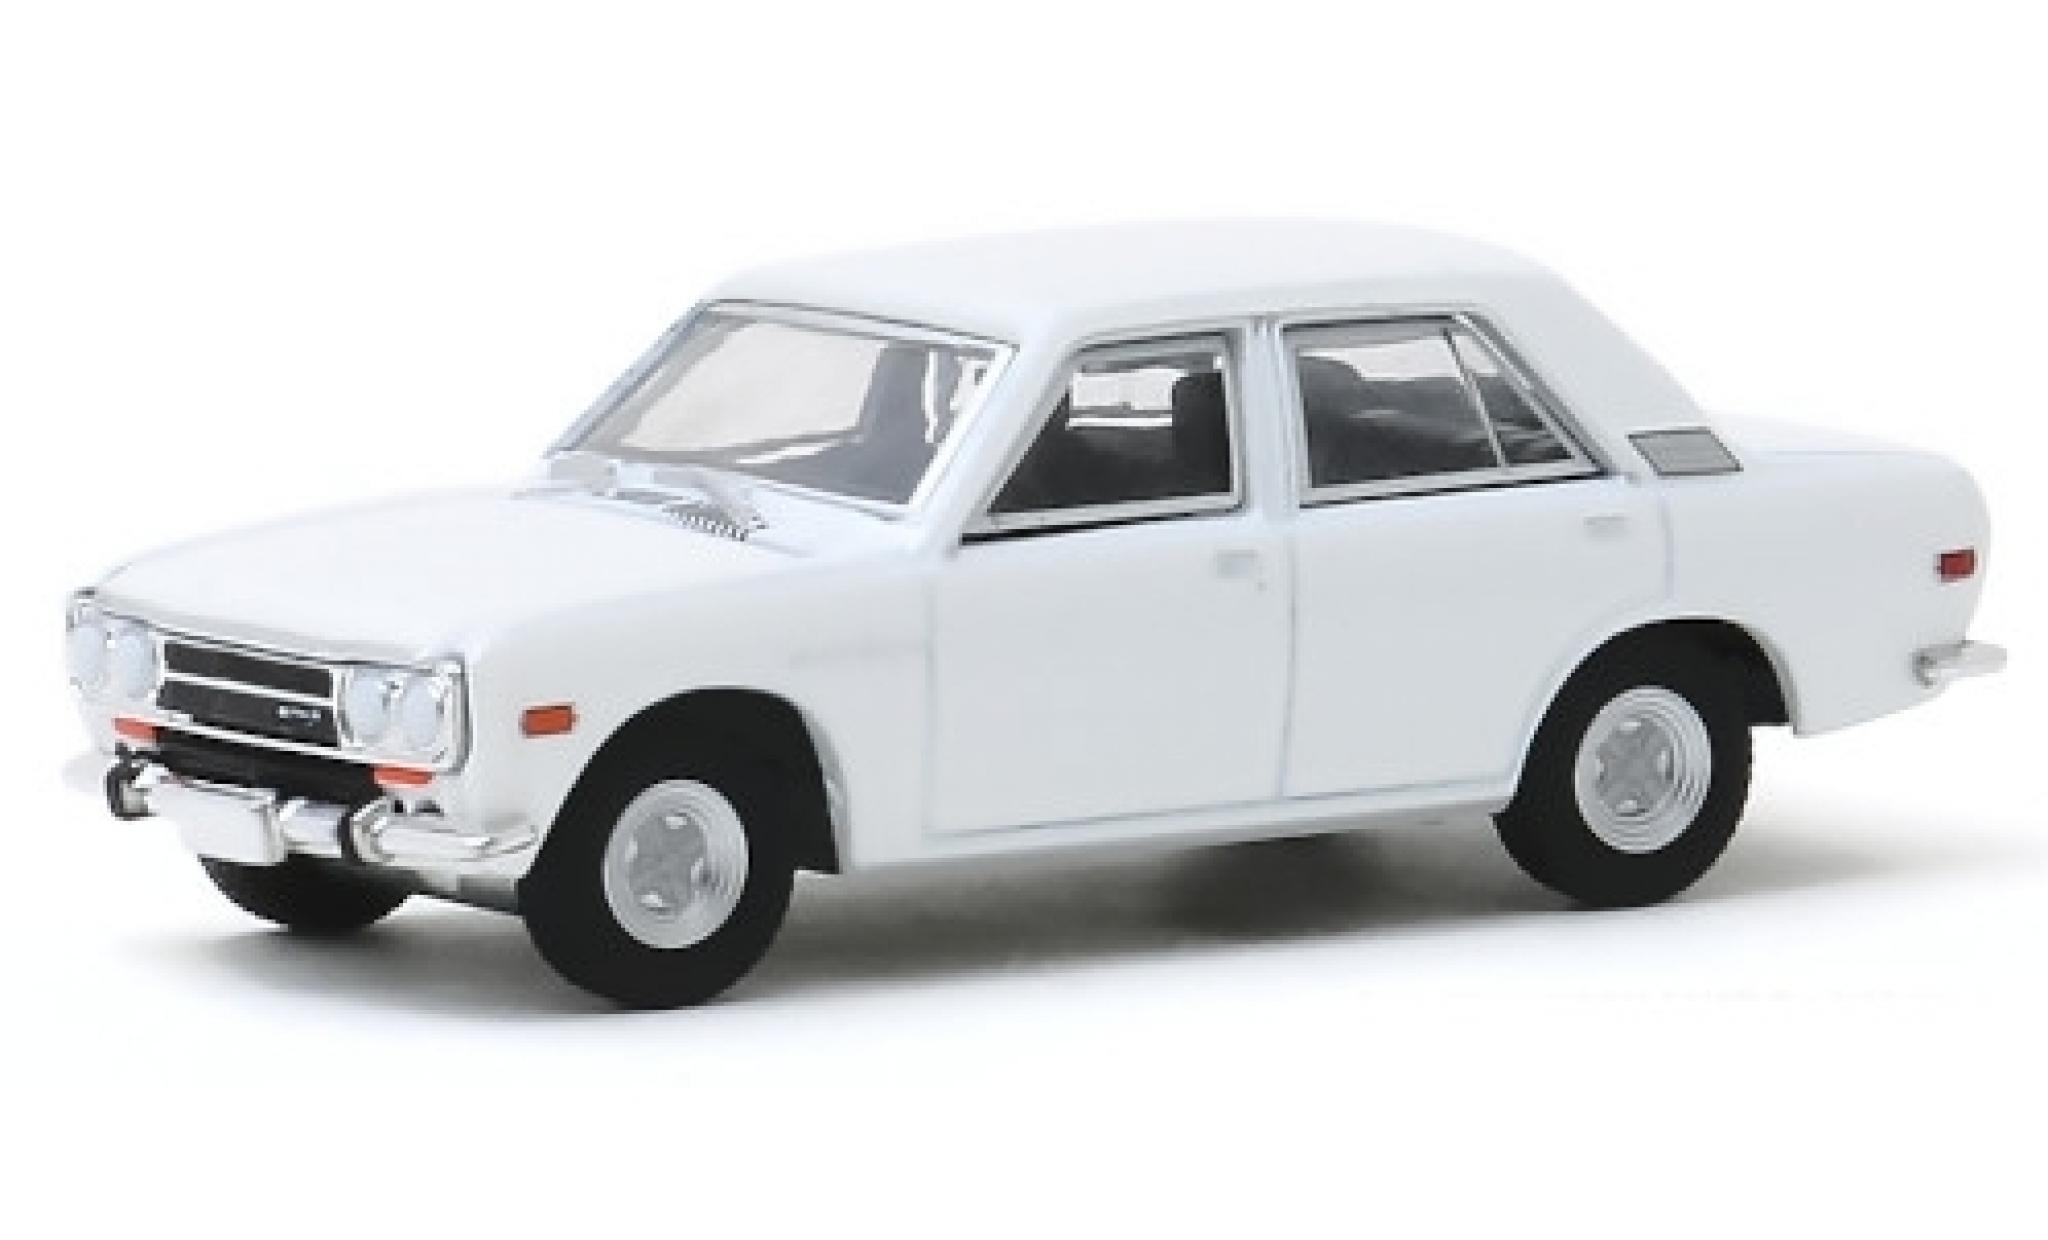 Datsun 510 1/64 Greenlight 4-Door Sedan blanche 1972